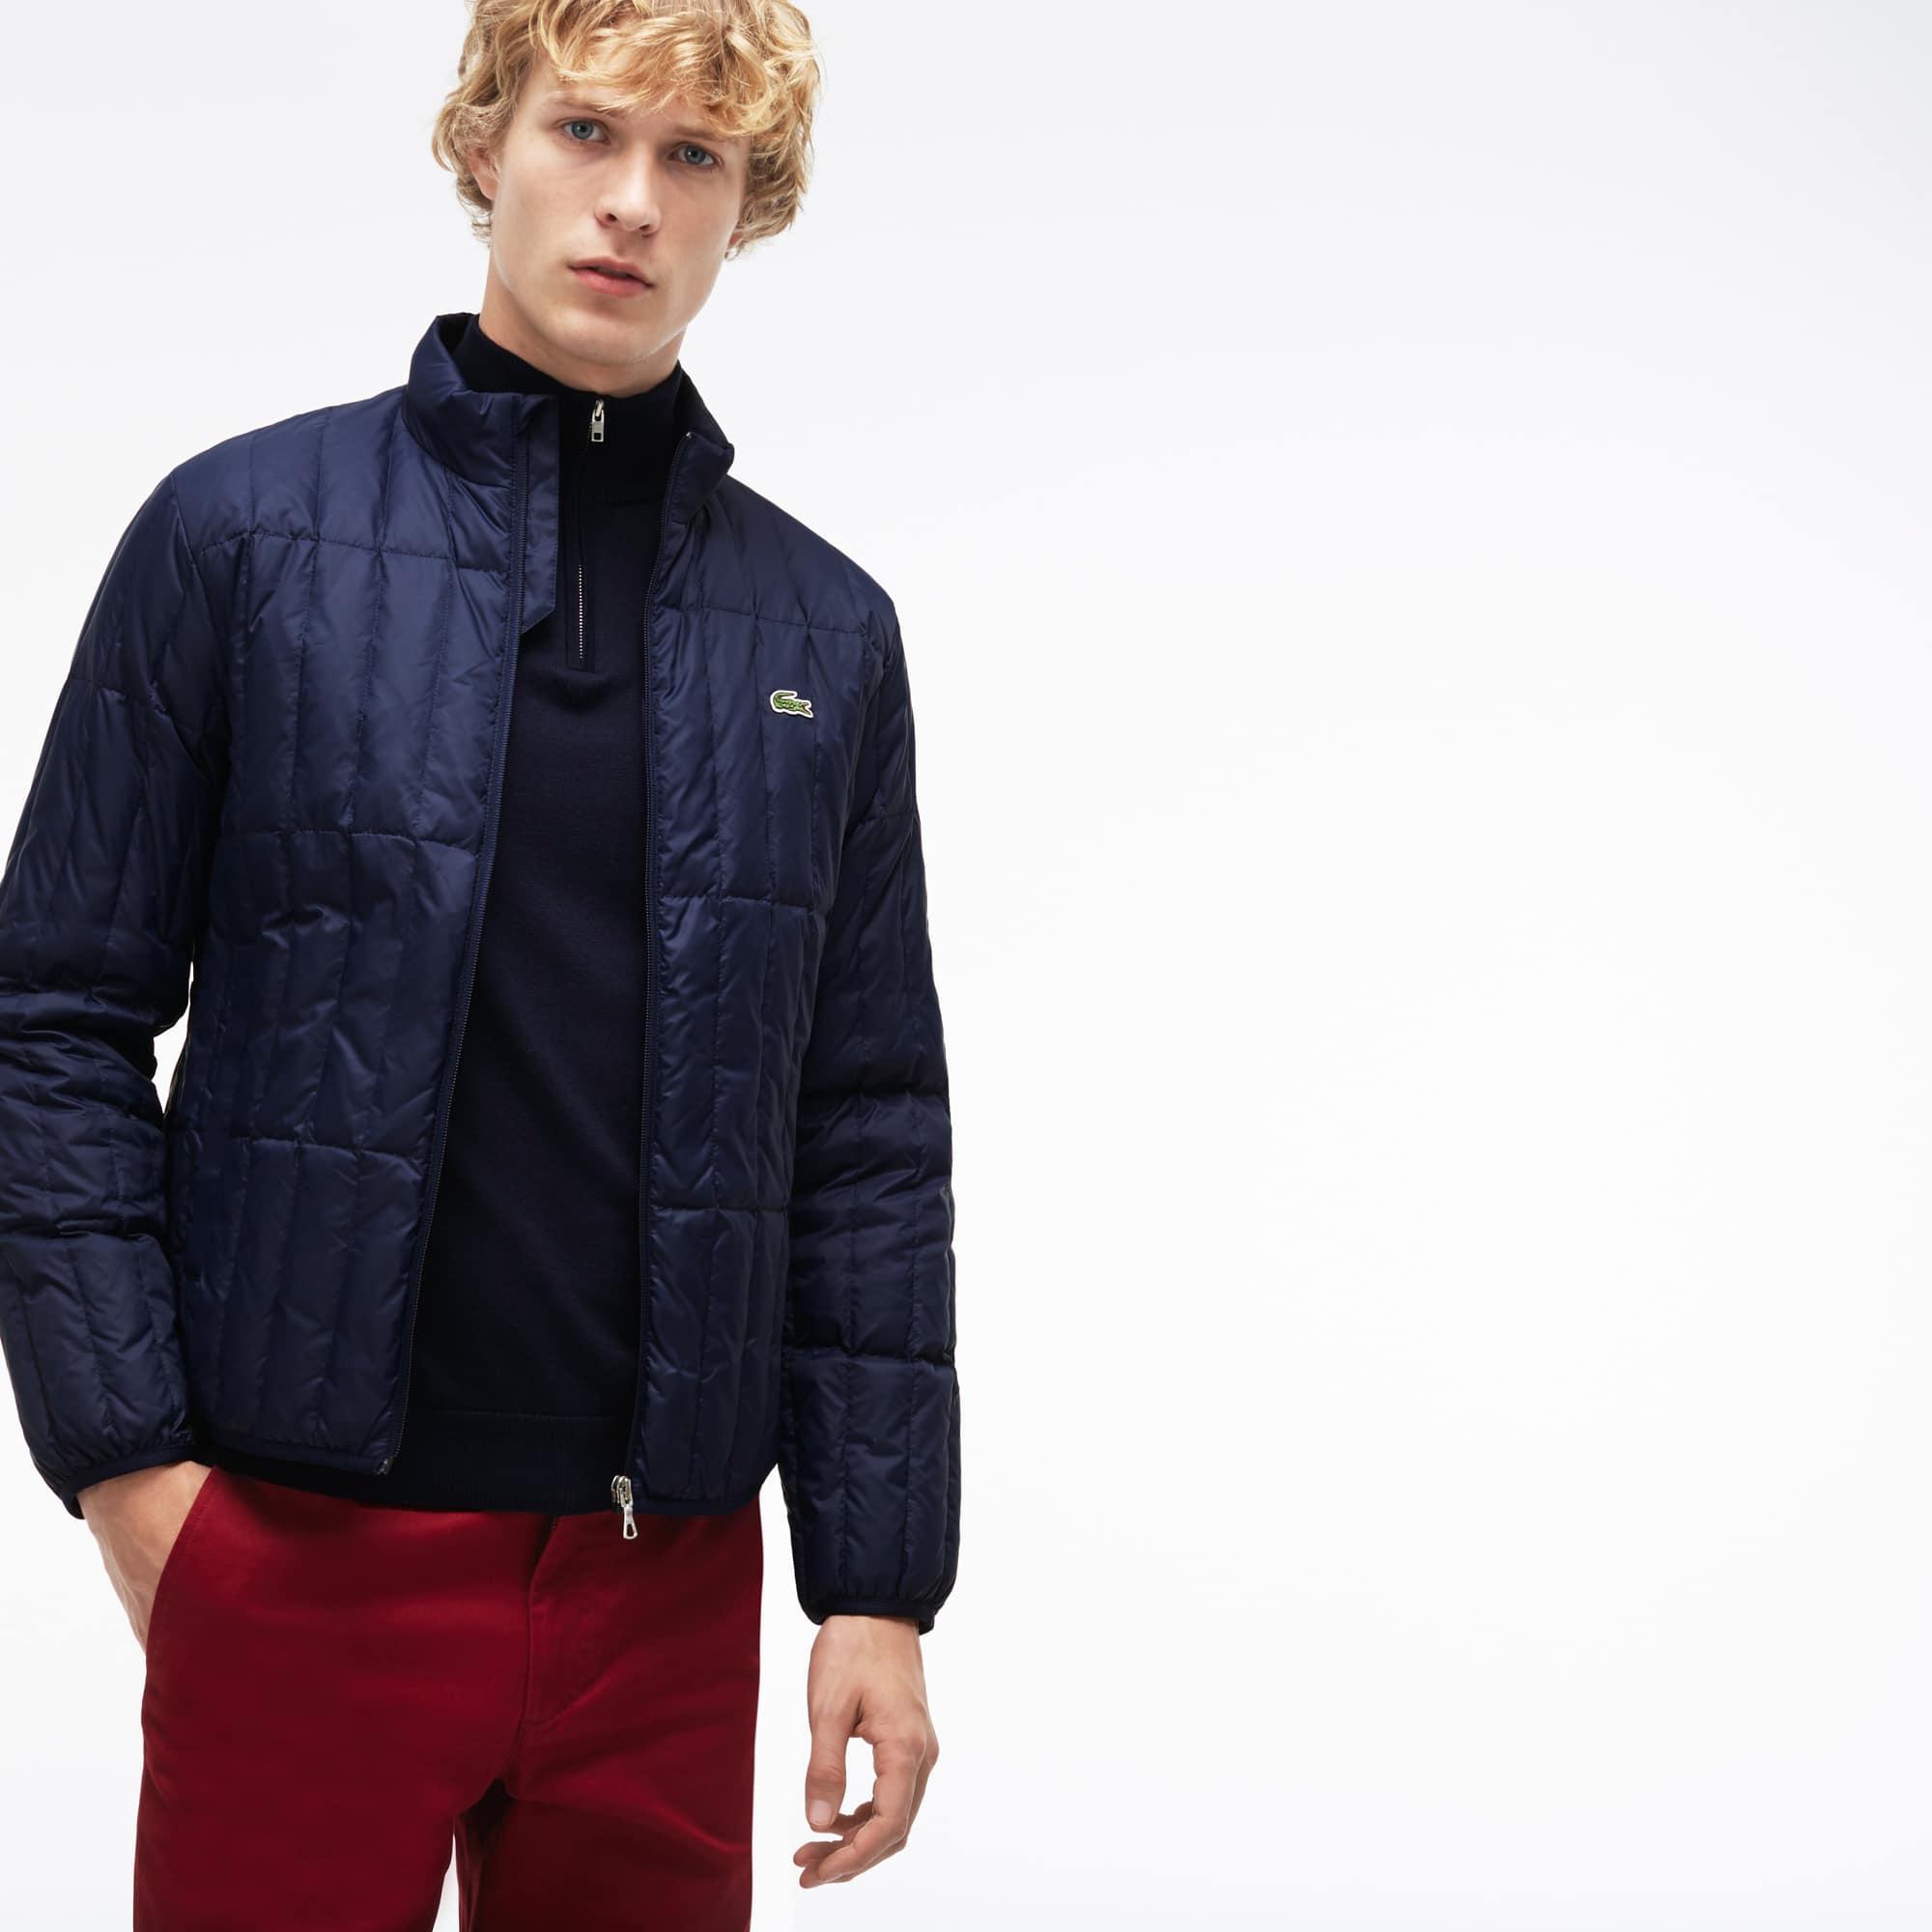 Men's Lightweight Built-in Hood Quilted Down Packable Jacket